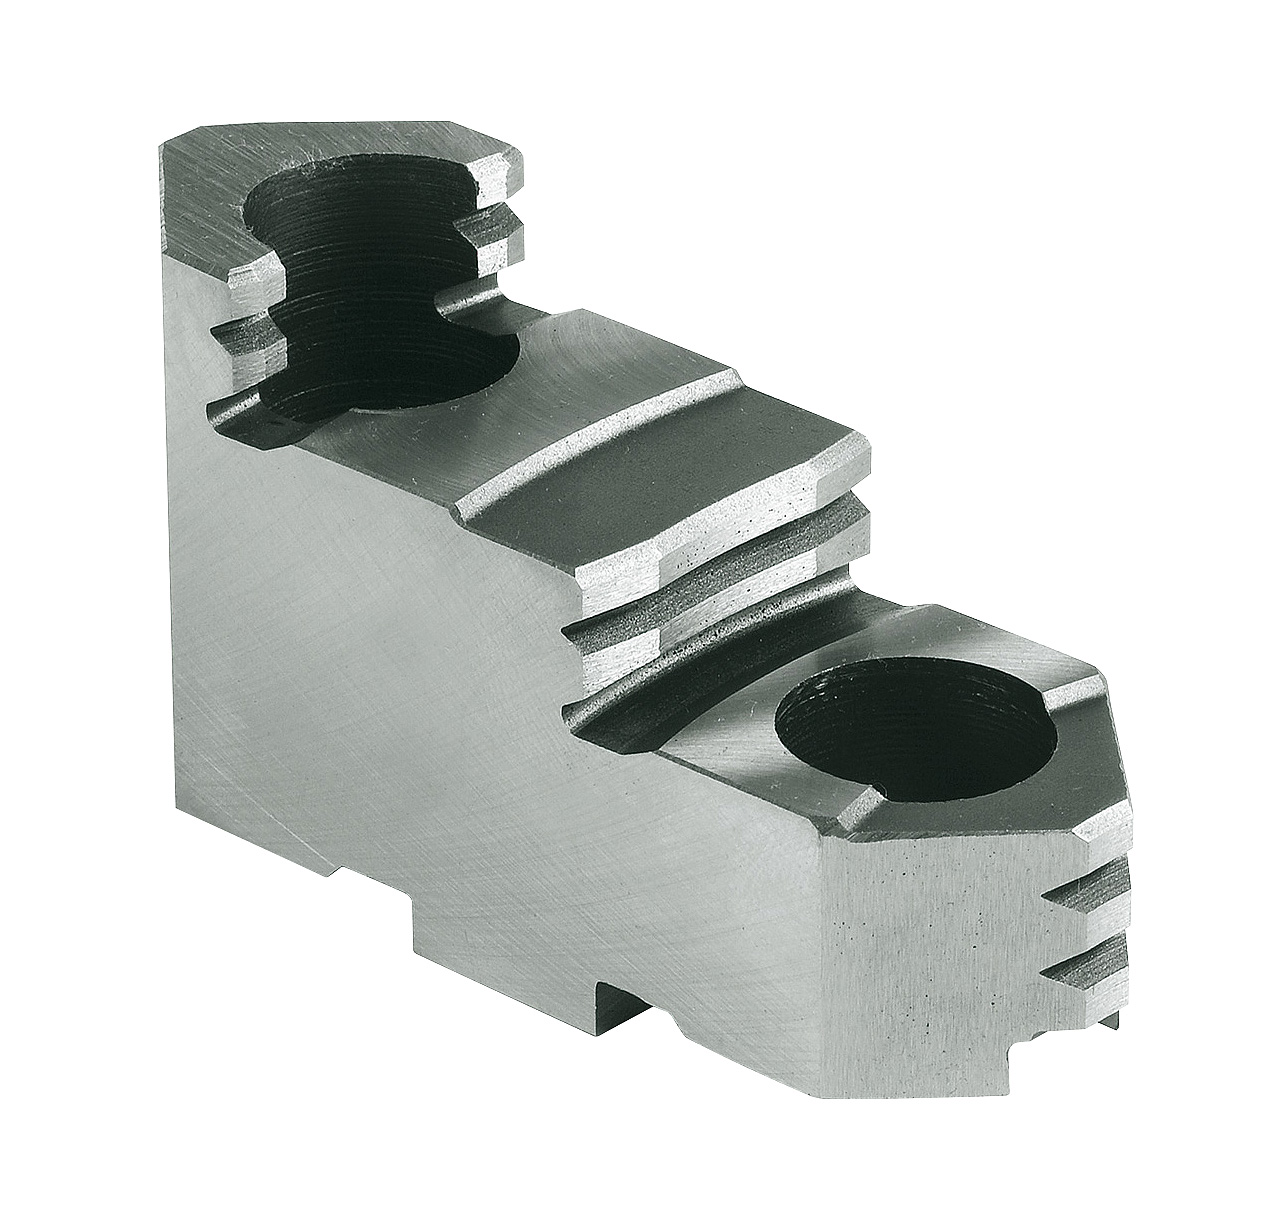 Szczęki górne twarde - komplet DTJ-DK11-500 BERNARDO